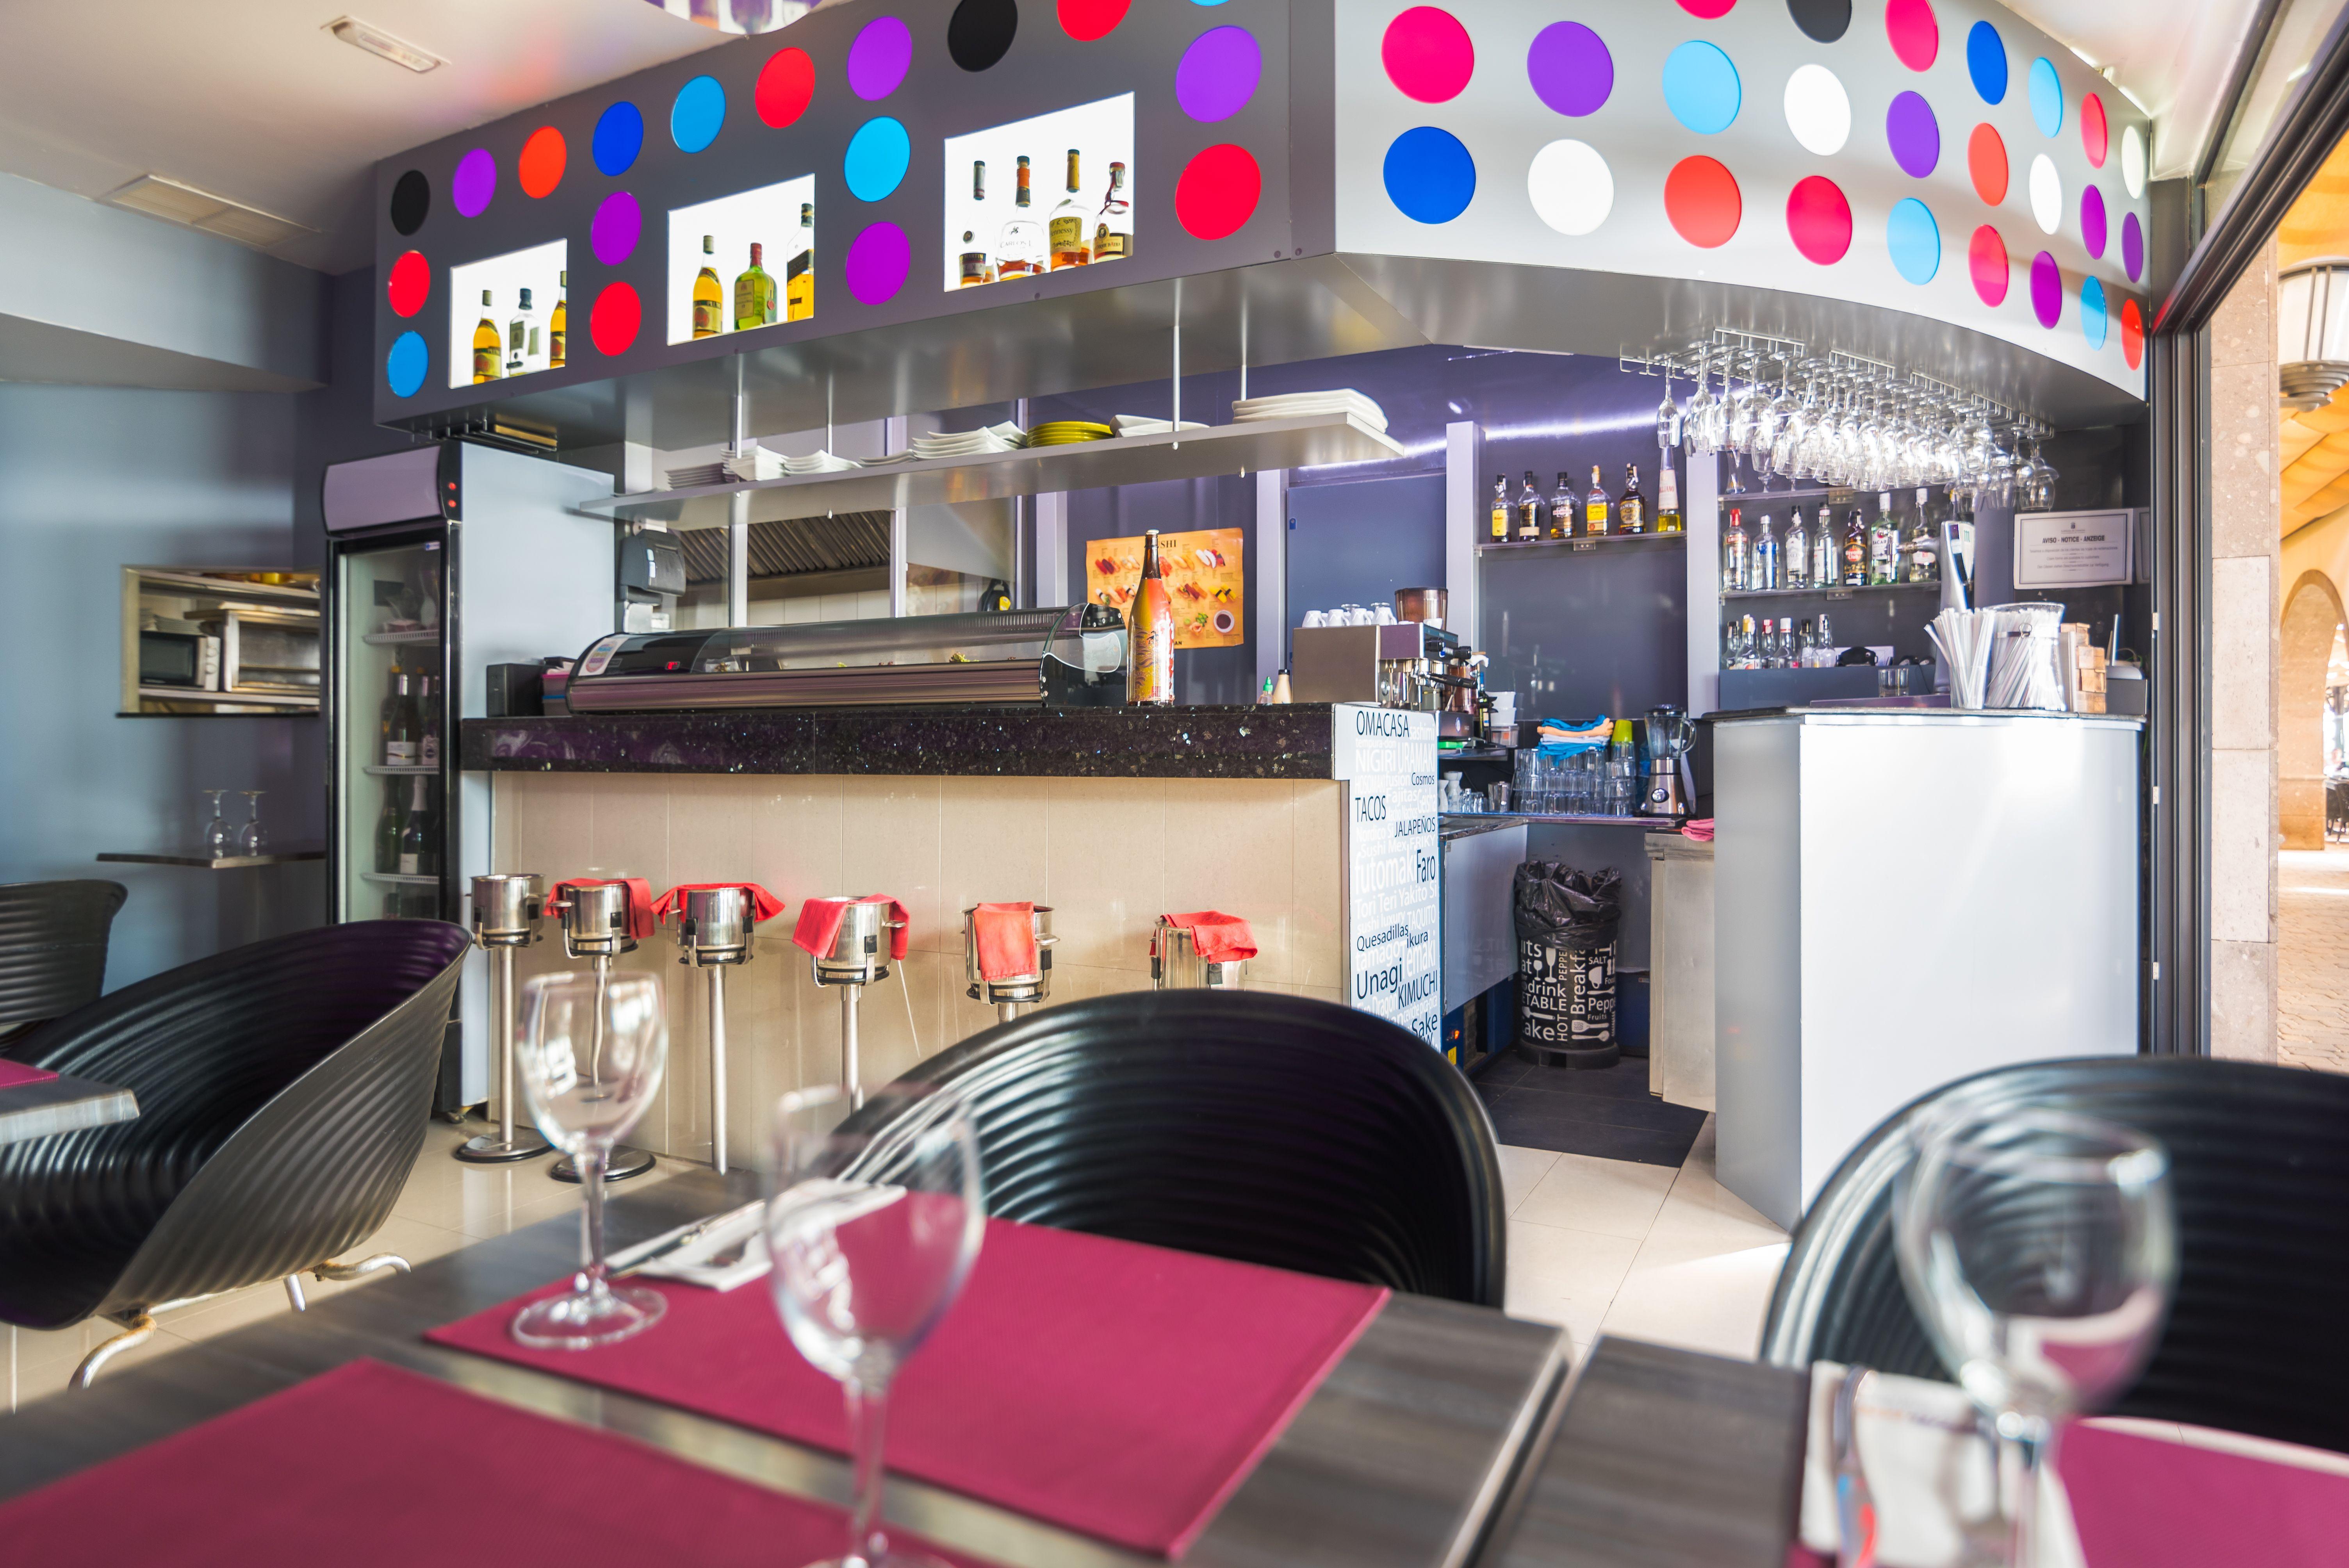 Foto 4 de Restaurante de comida fusión en San Bartolomé de Tirajana | Restaurante SushiMex